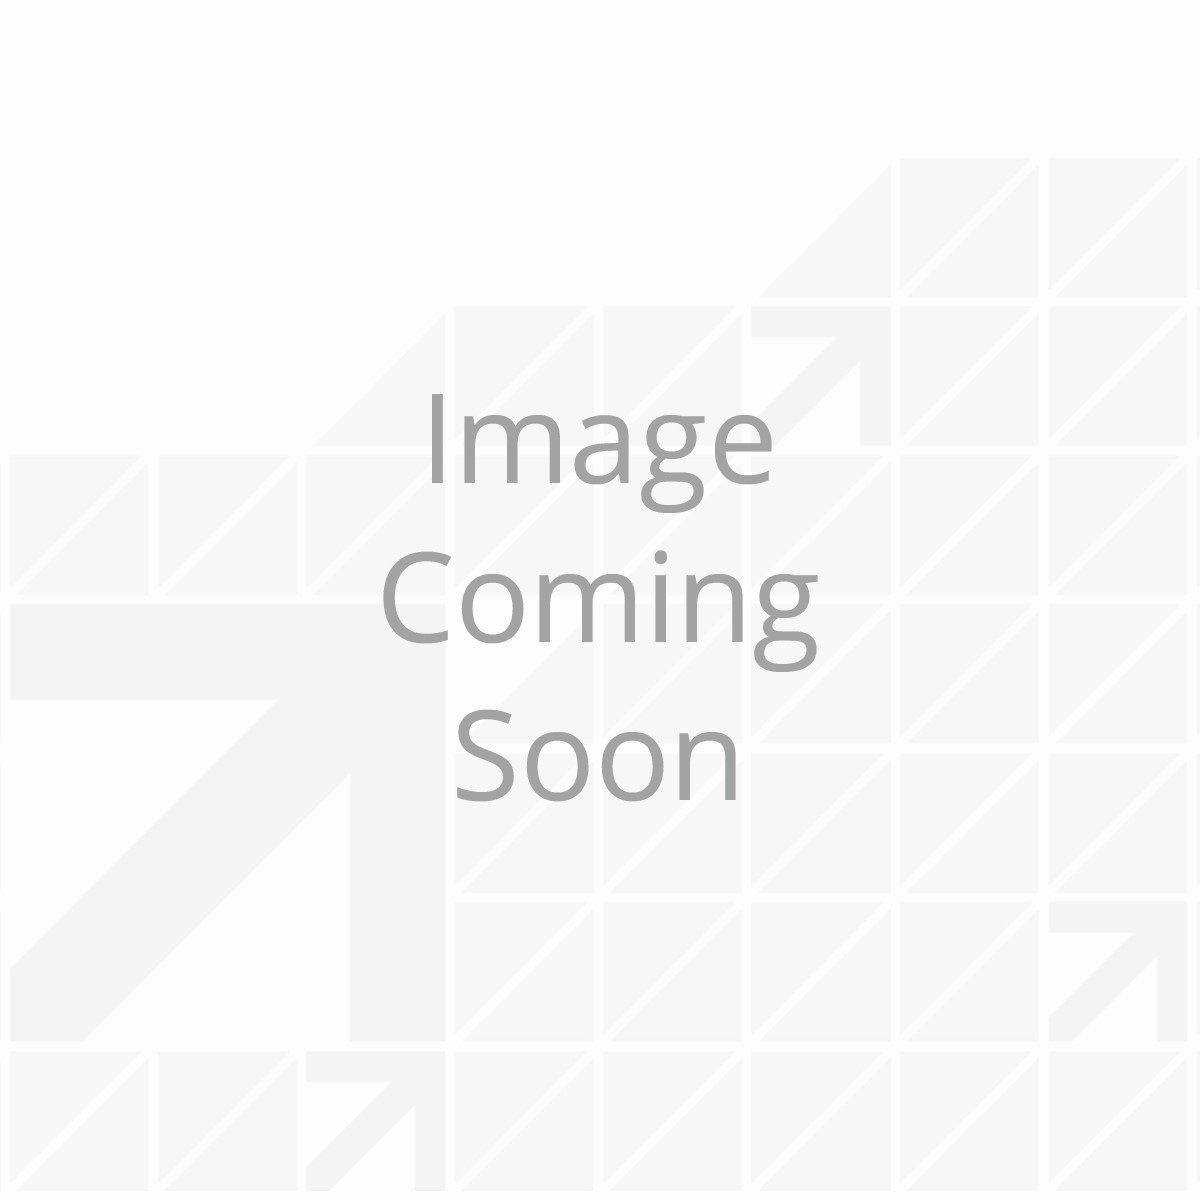 Denver Mattress® RV Supreme Euro Top Foam Mattress